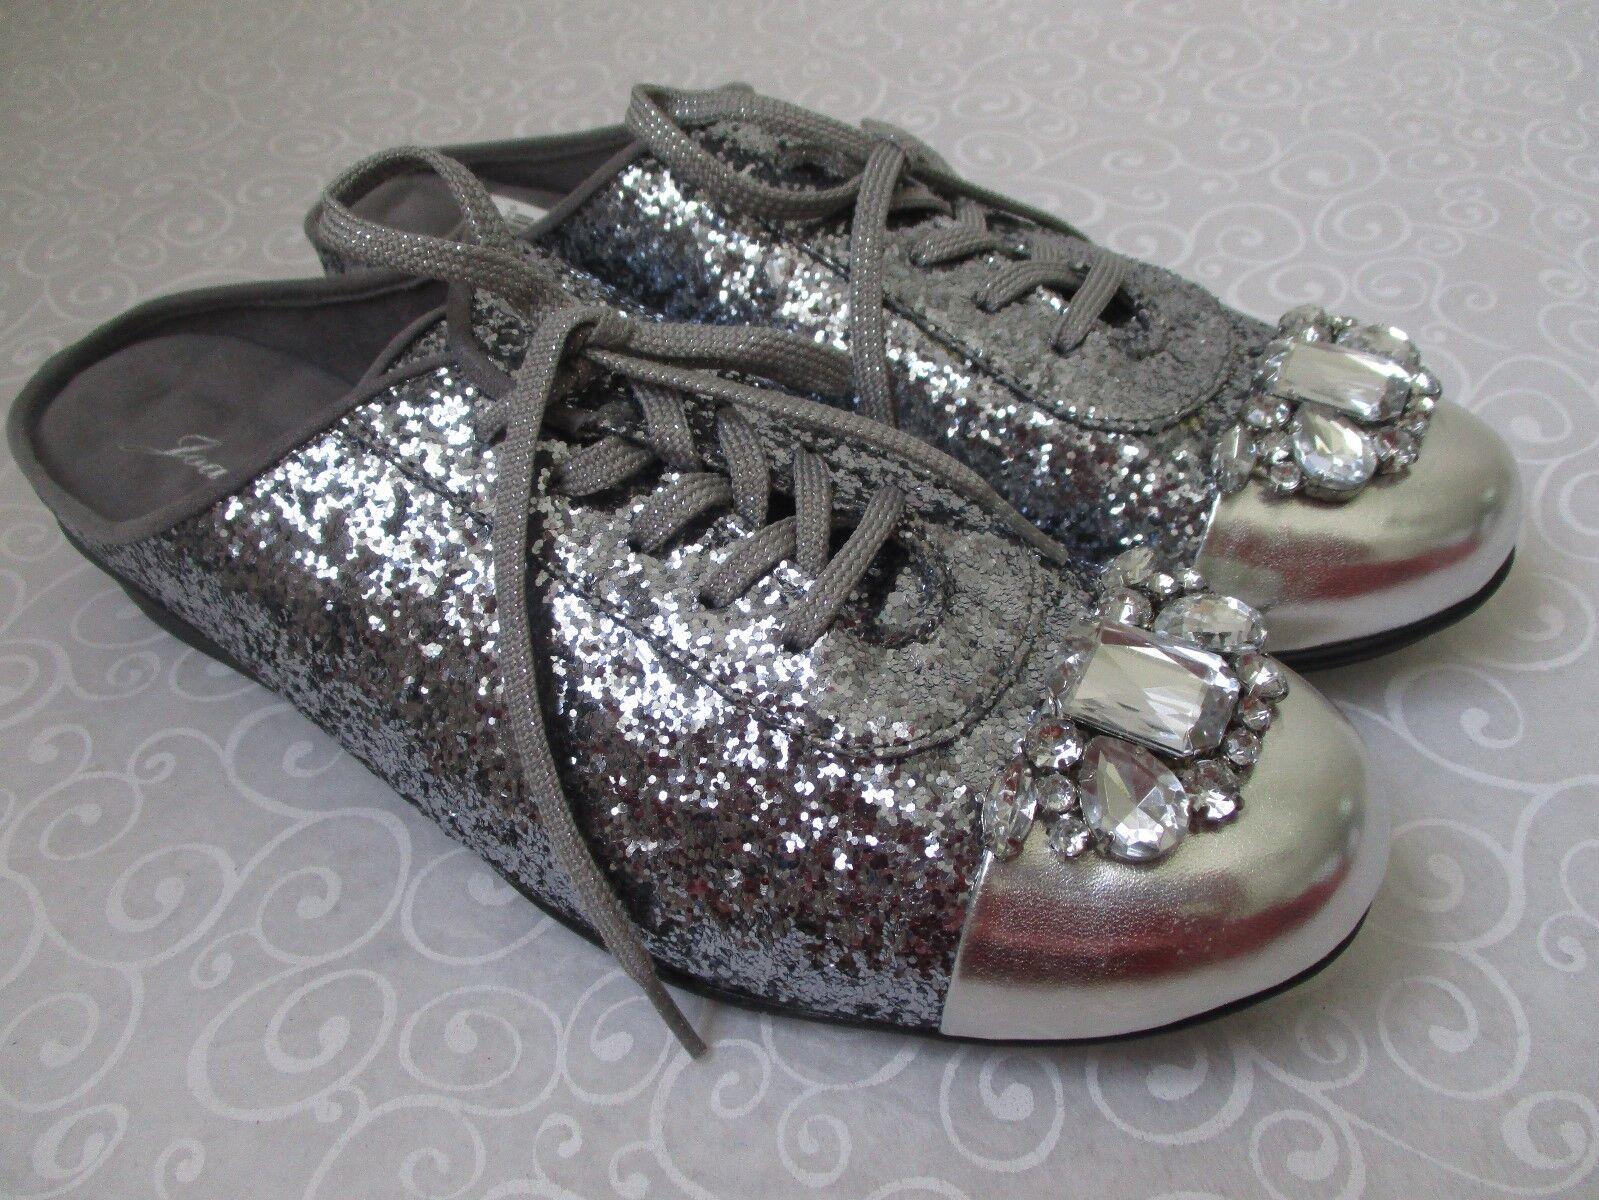 JOAN BOYCE DENISE PEWTER GLITTER & SILVER JEWELED FLATS Schuhe SIZE 8 W - NEU